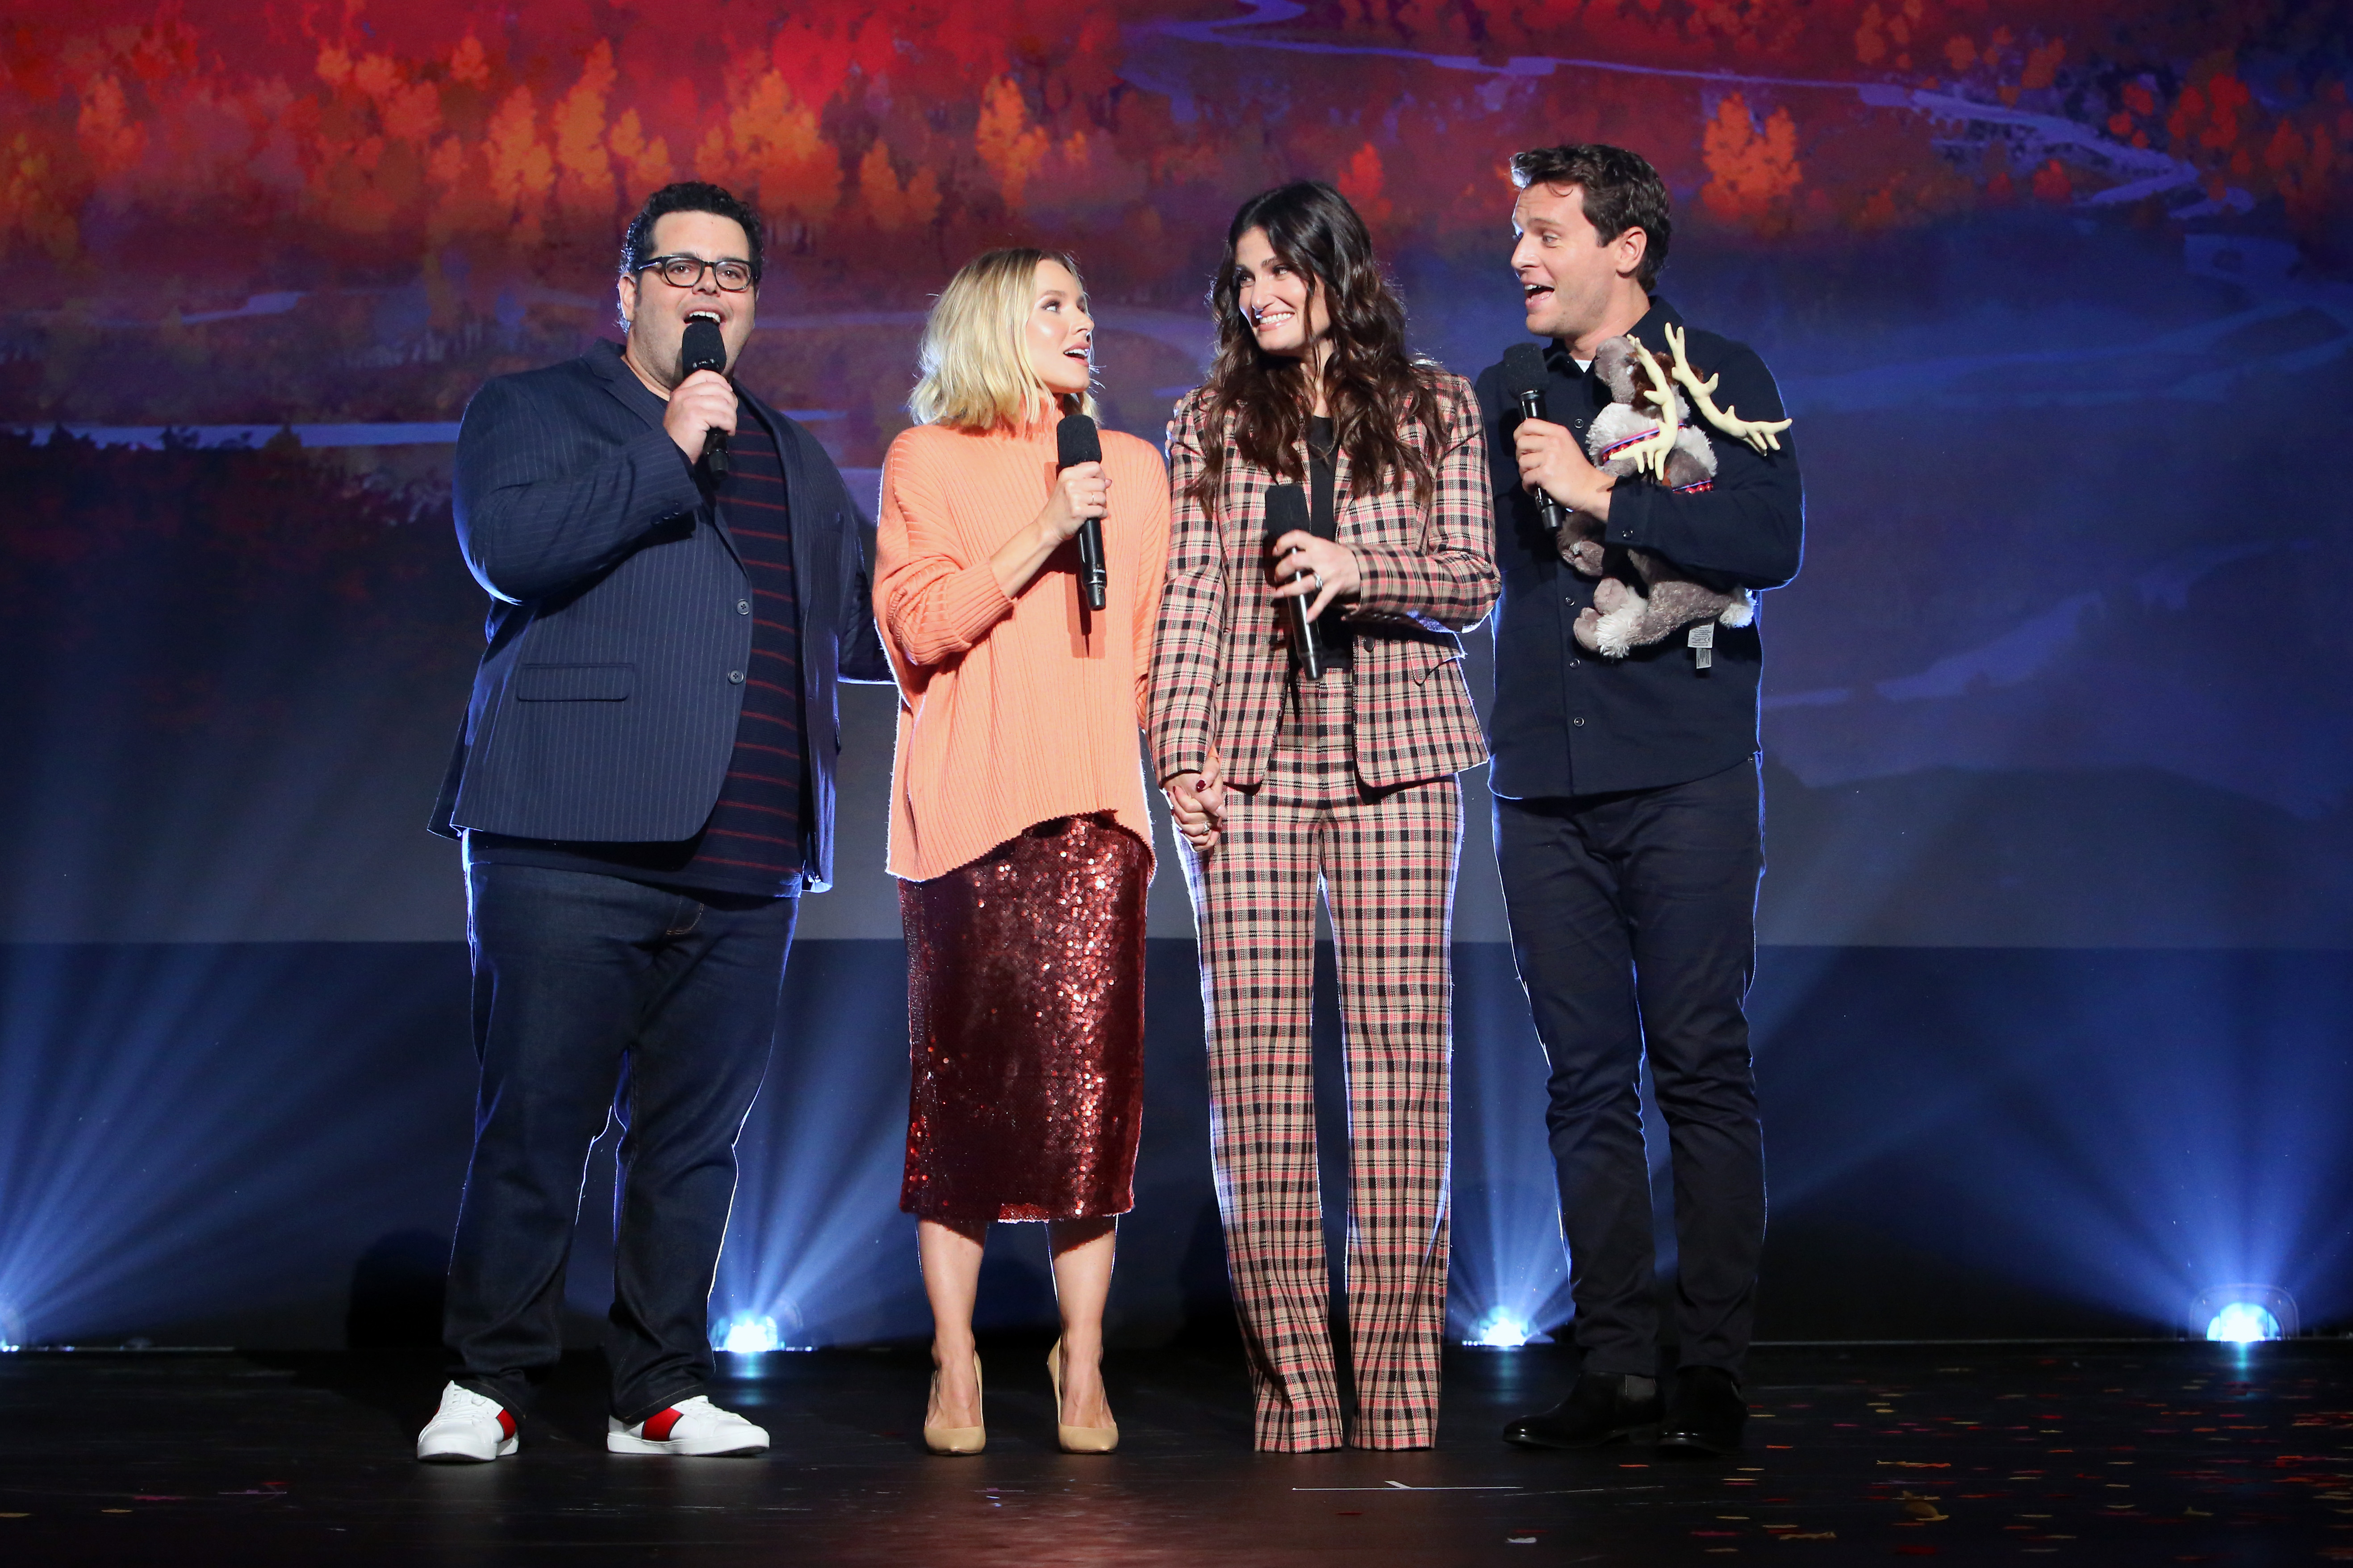 Josh Gad, Kristen Bell, Idina Menzel y Jonathan Groff de Frozen 2 cerraron el show. / Foto: Getty Images for Disney